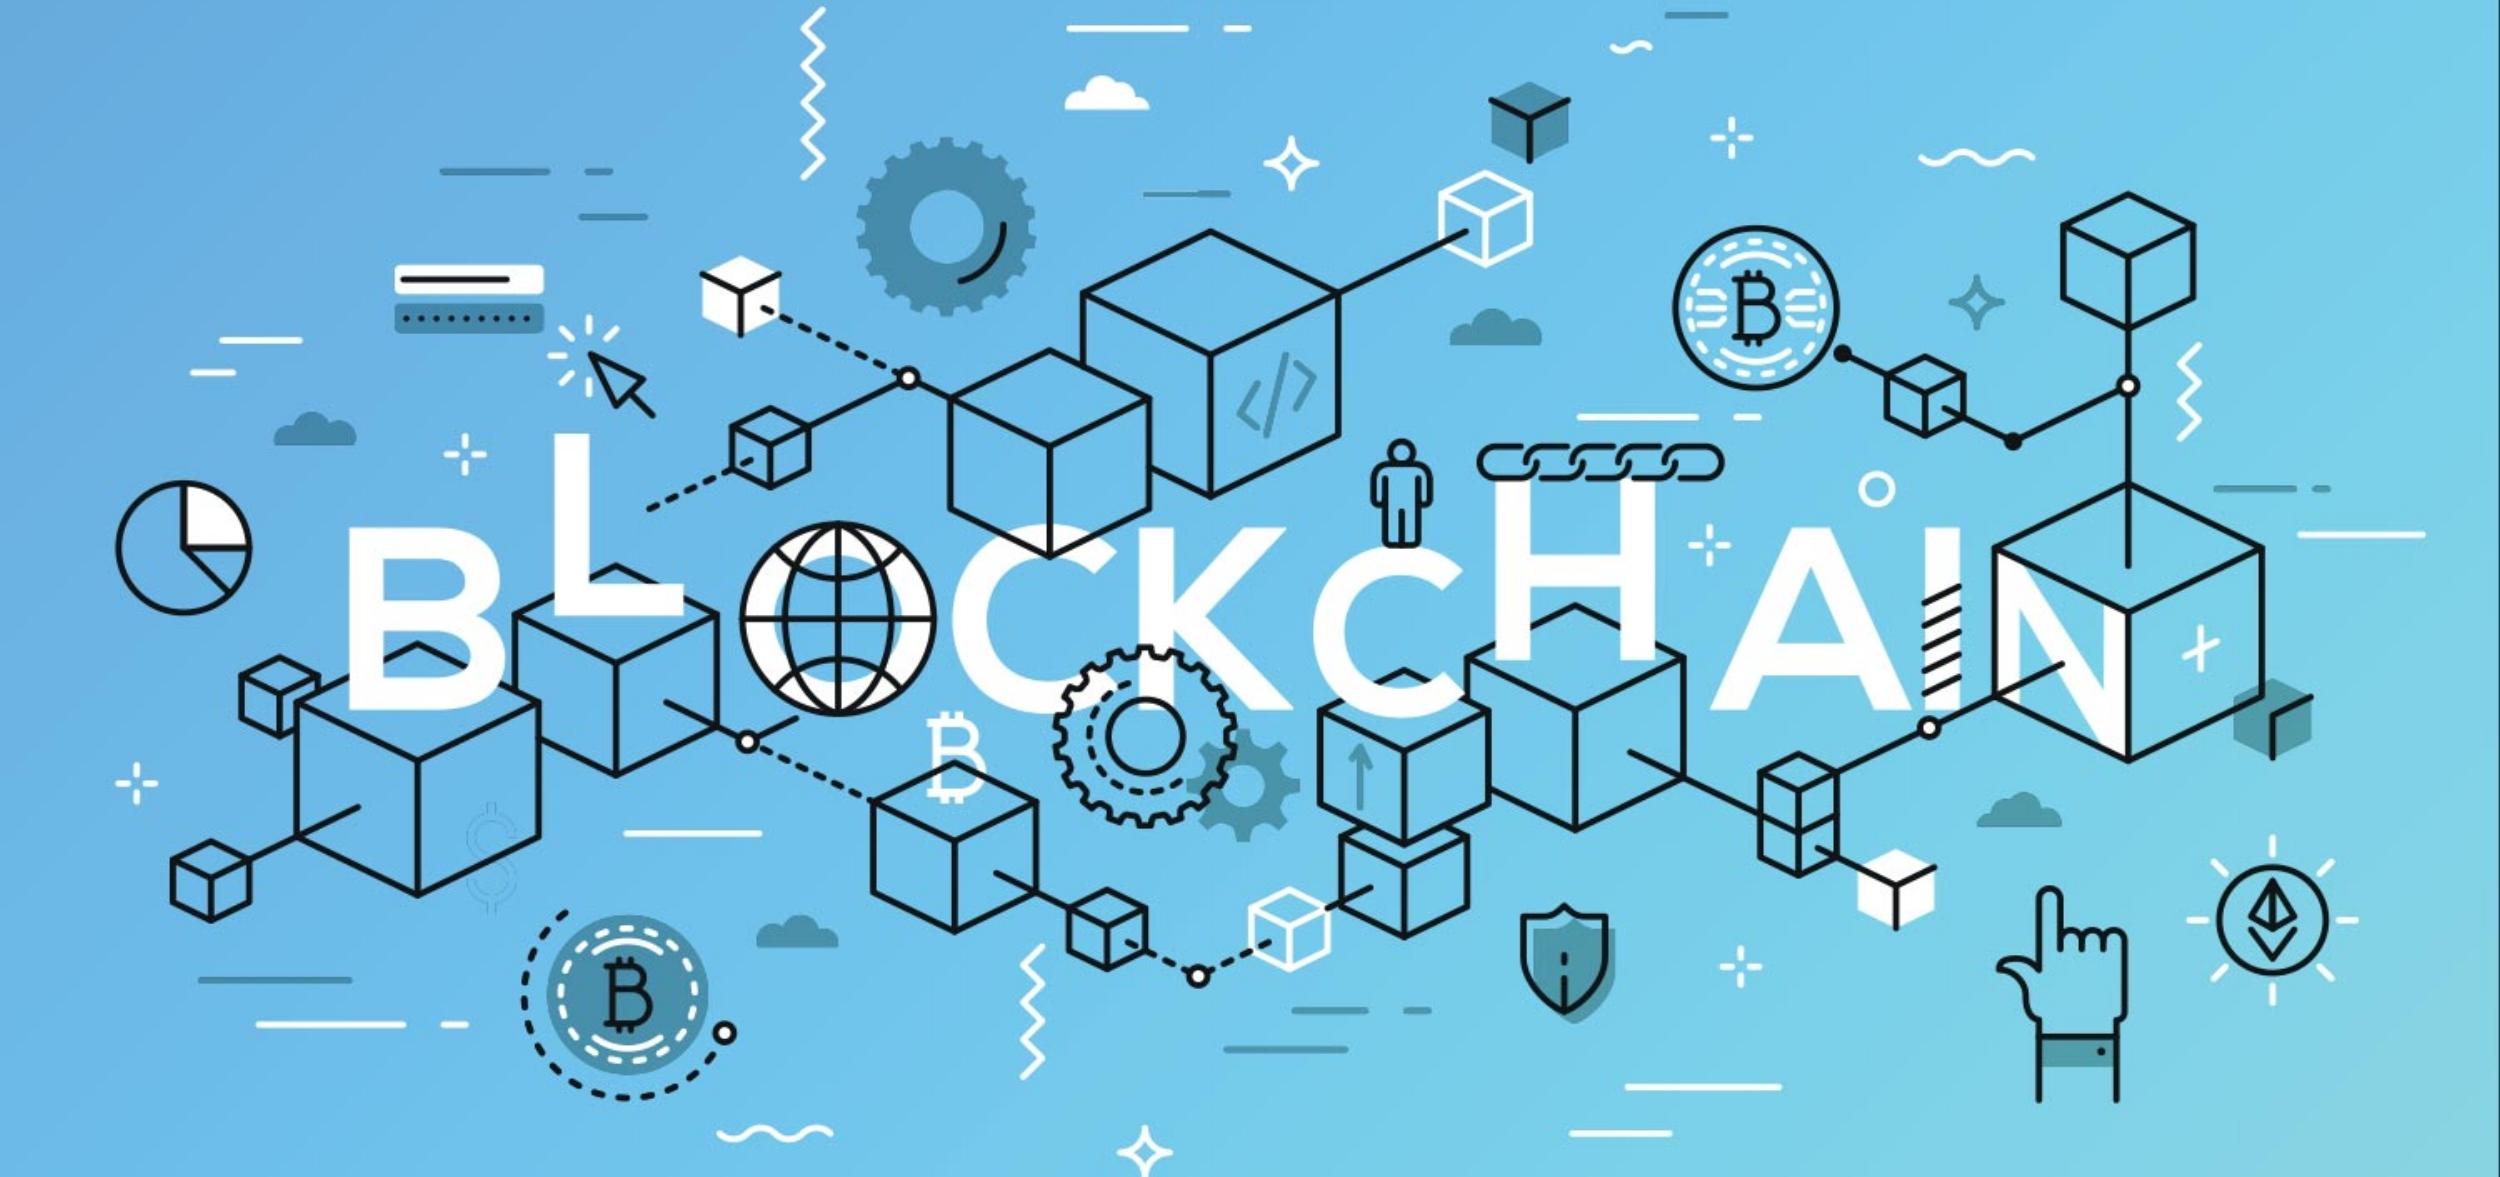 The-Benefits-of-Blockchain-Decentralization.jpg